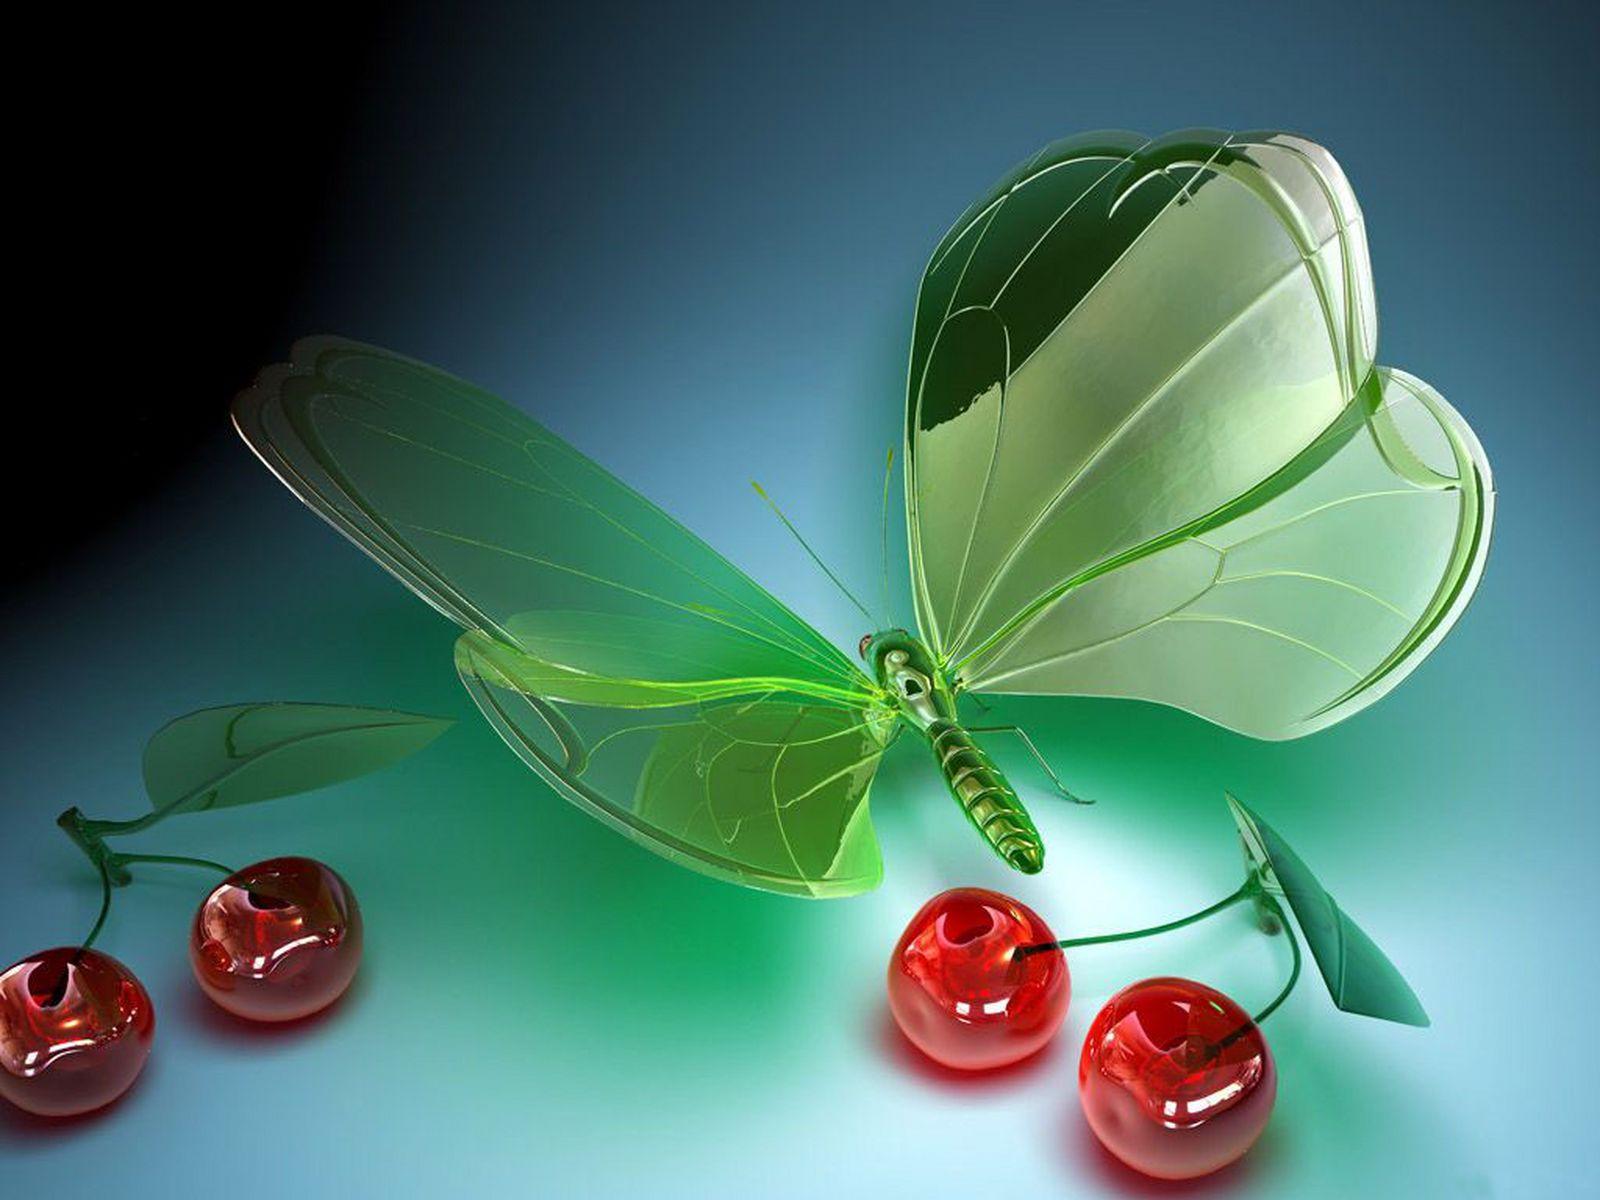 http://2.bp.blogspot.com/-t-rdvCAb_KM/UENjwWTEpMI/AAAAAAAADnY/FGdcTFNMfWE/s1600/3D-Glass-Imaginations-29.jpg